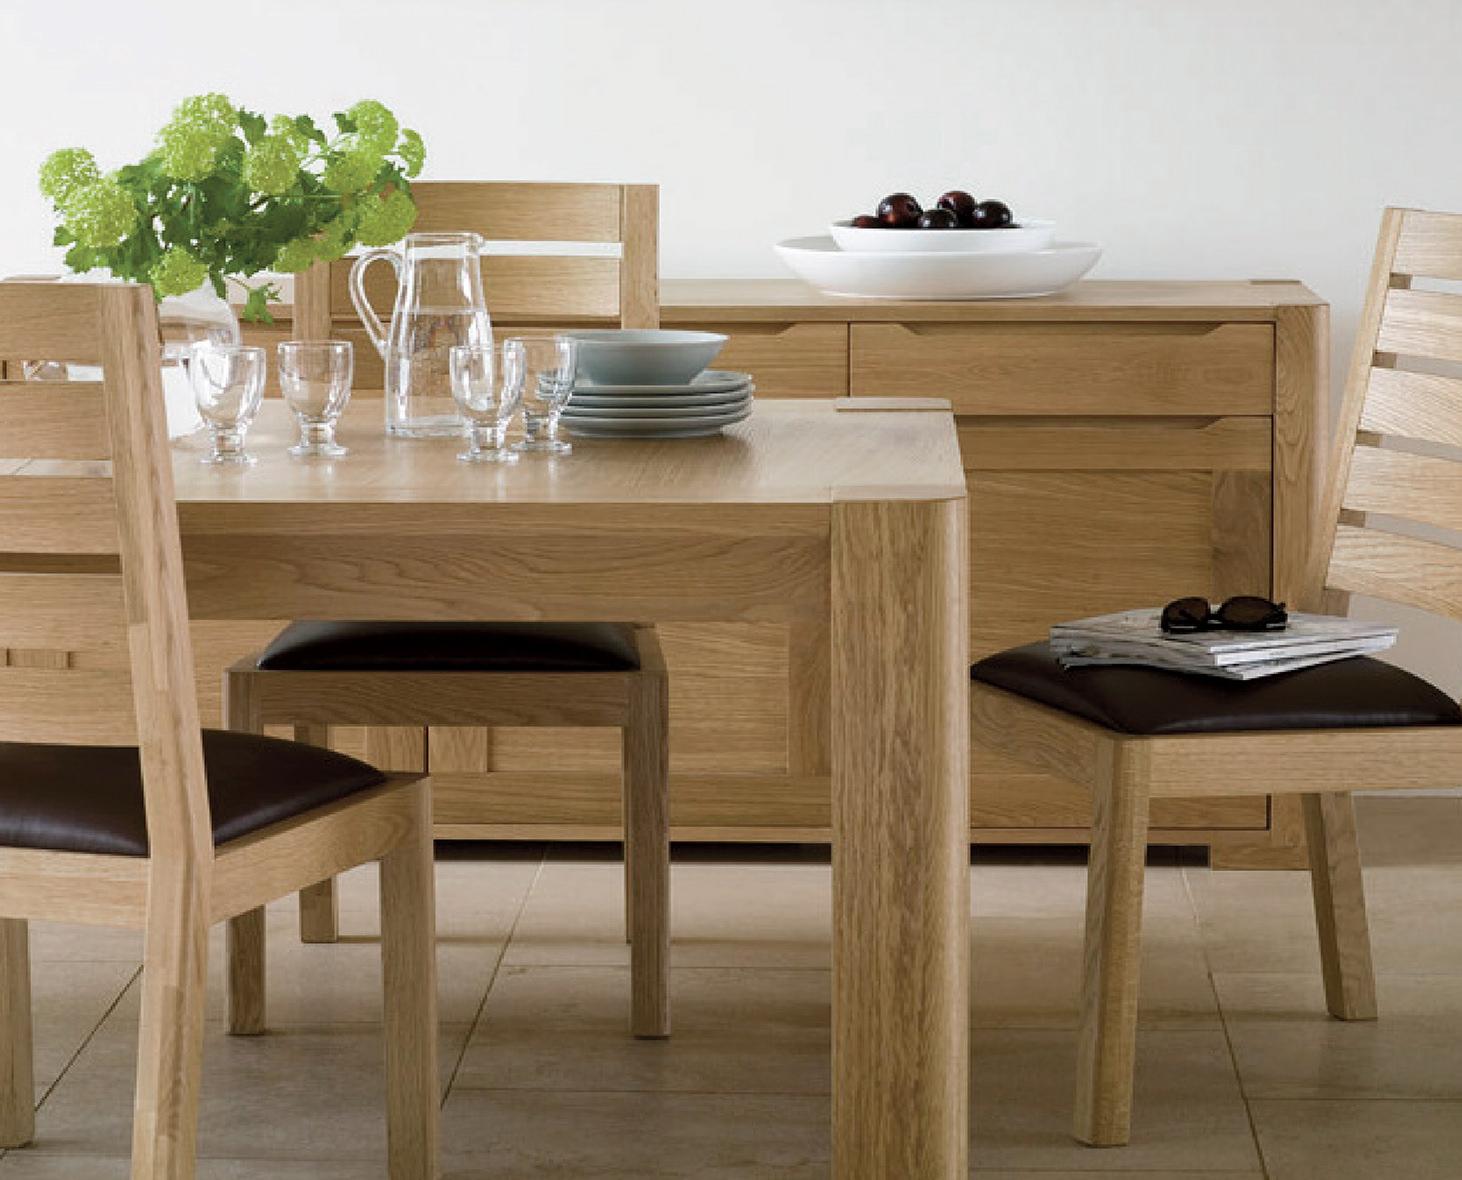 baker-furniture-alpha-living.jpg